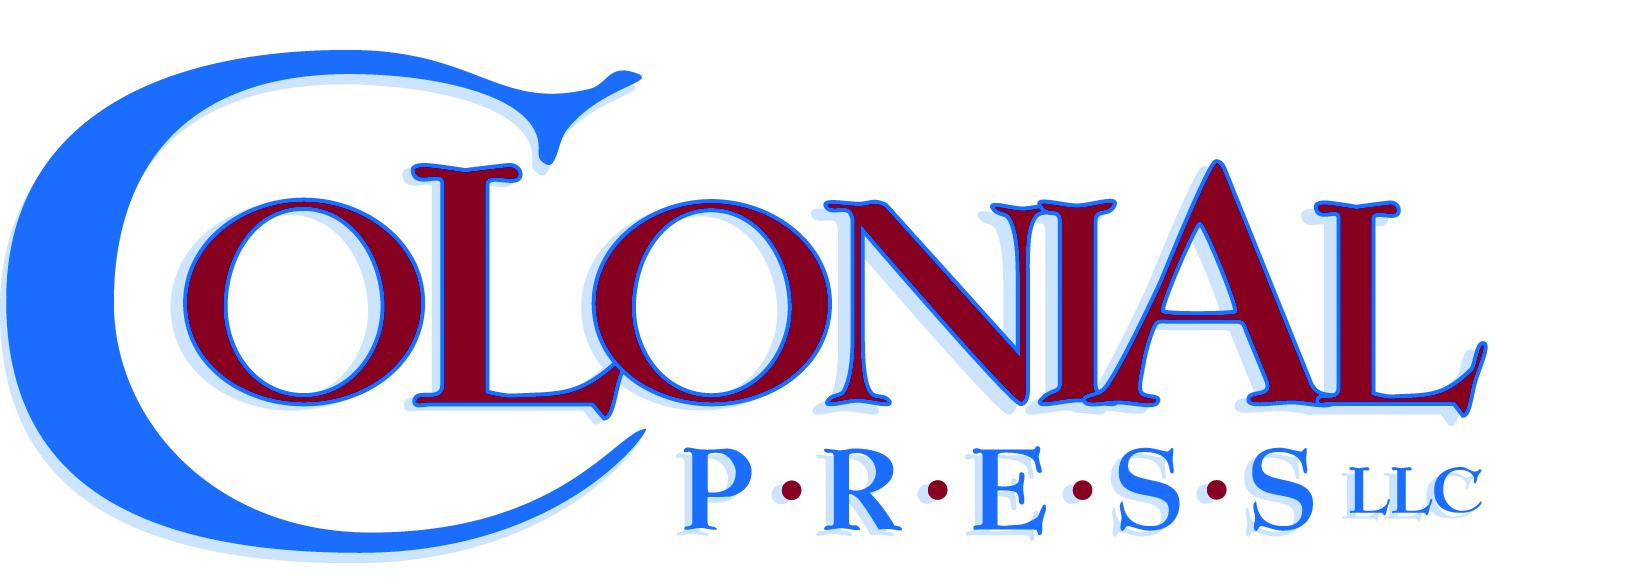 Colonial Press Logo